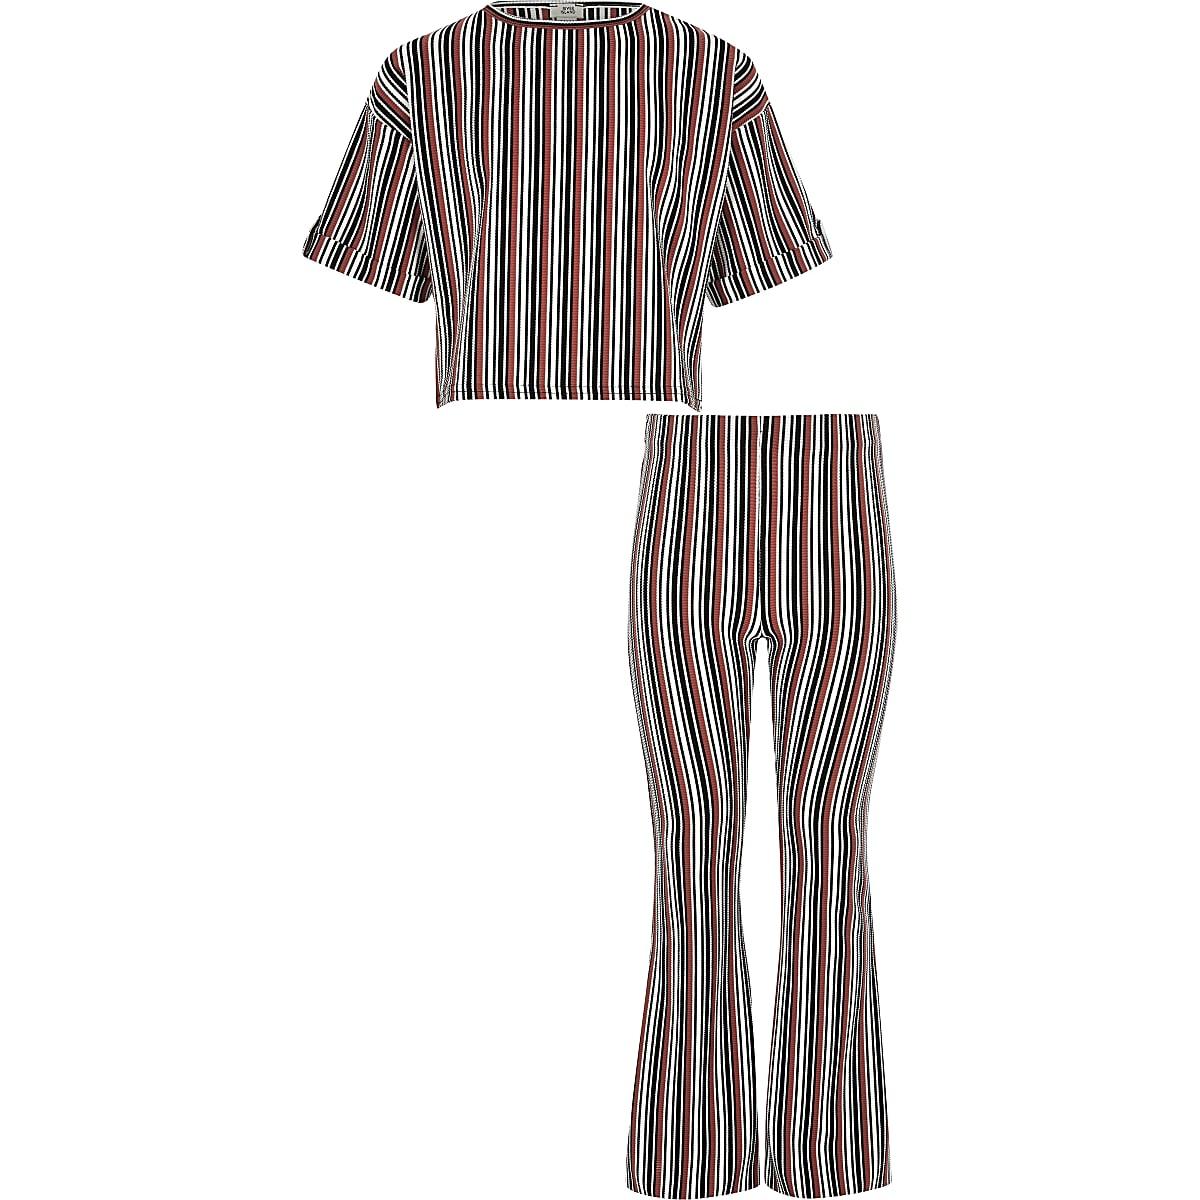 Girls black stripe T-shirt outfit